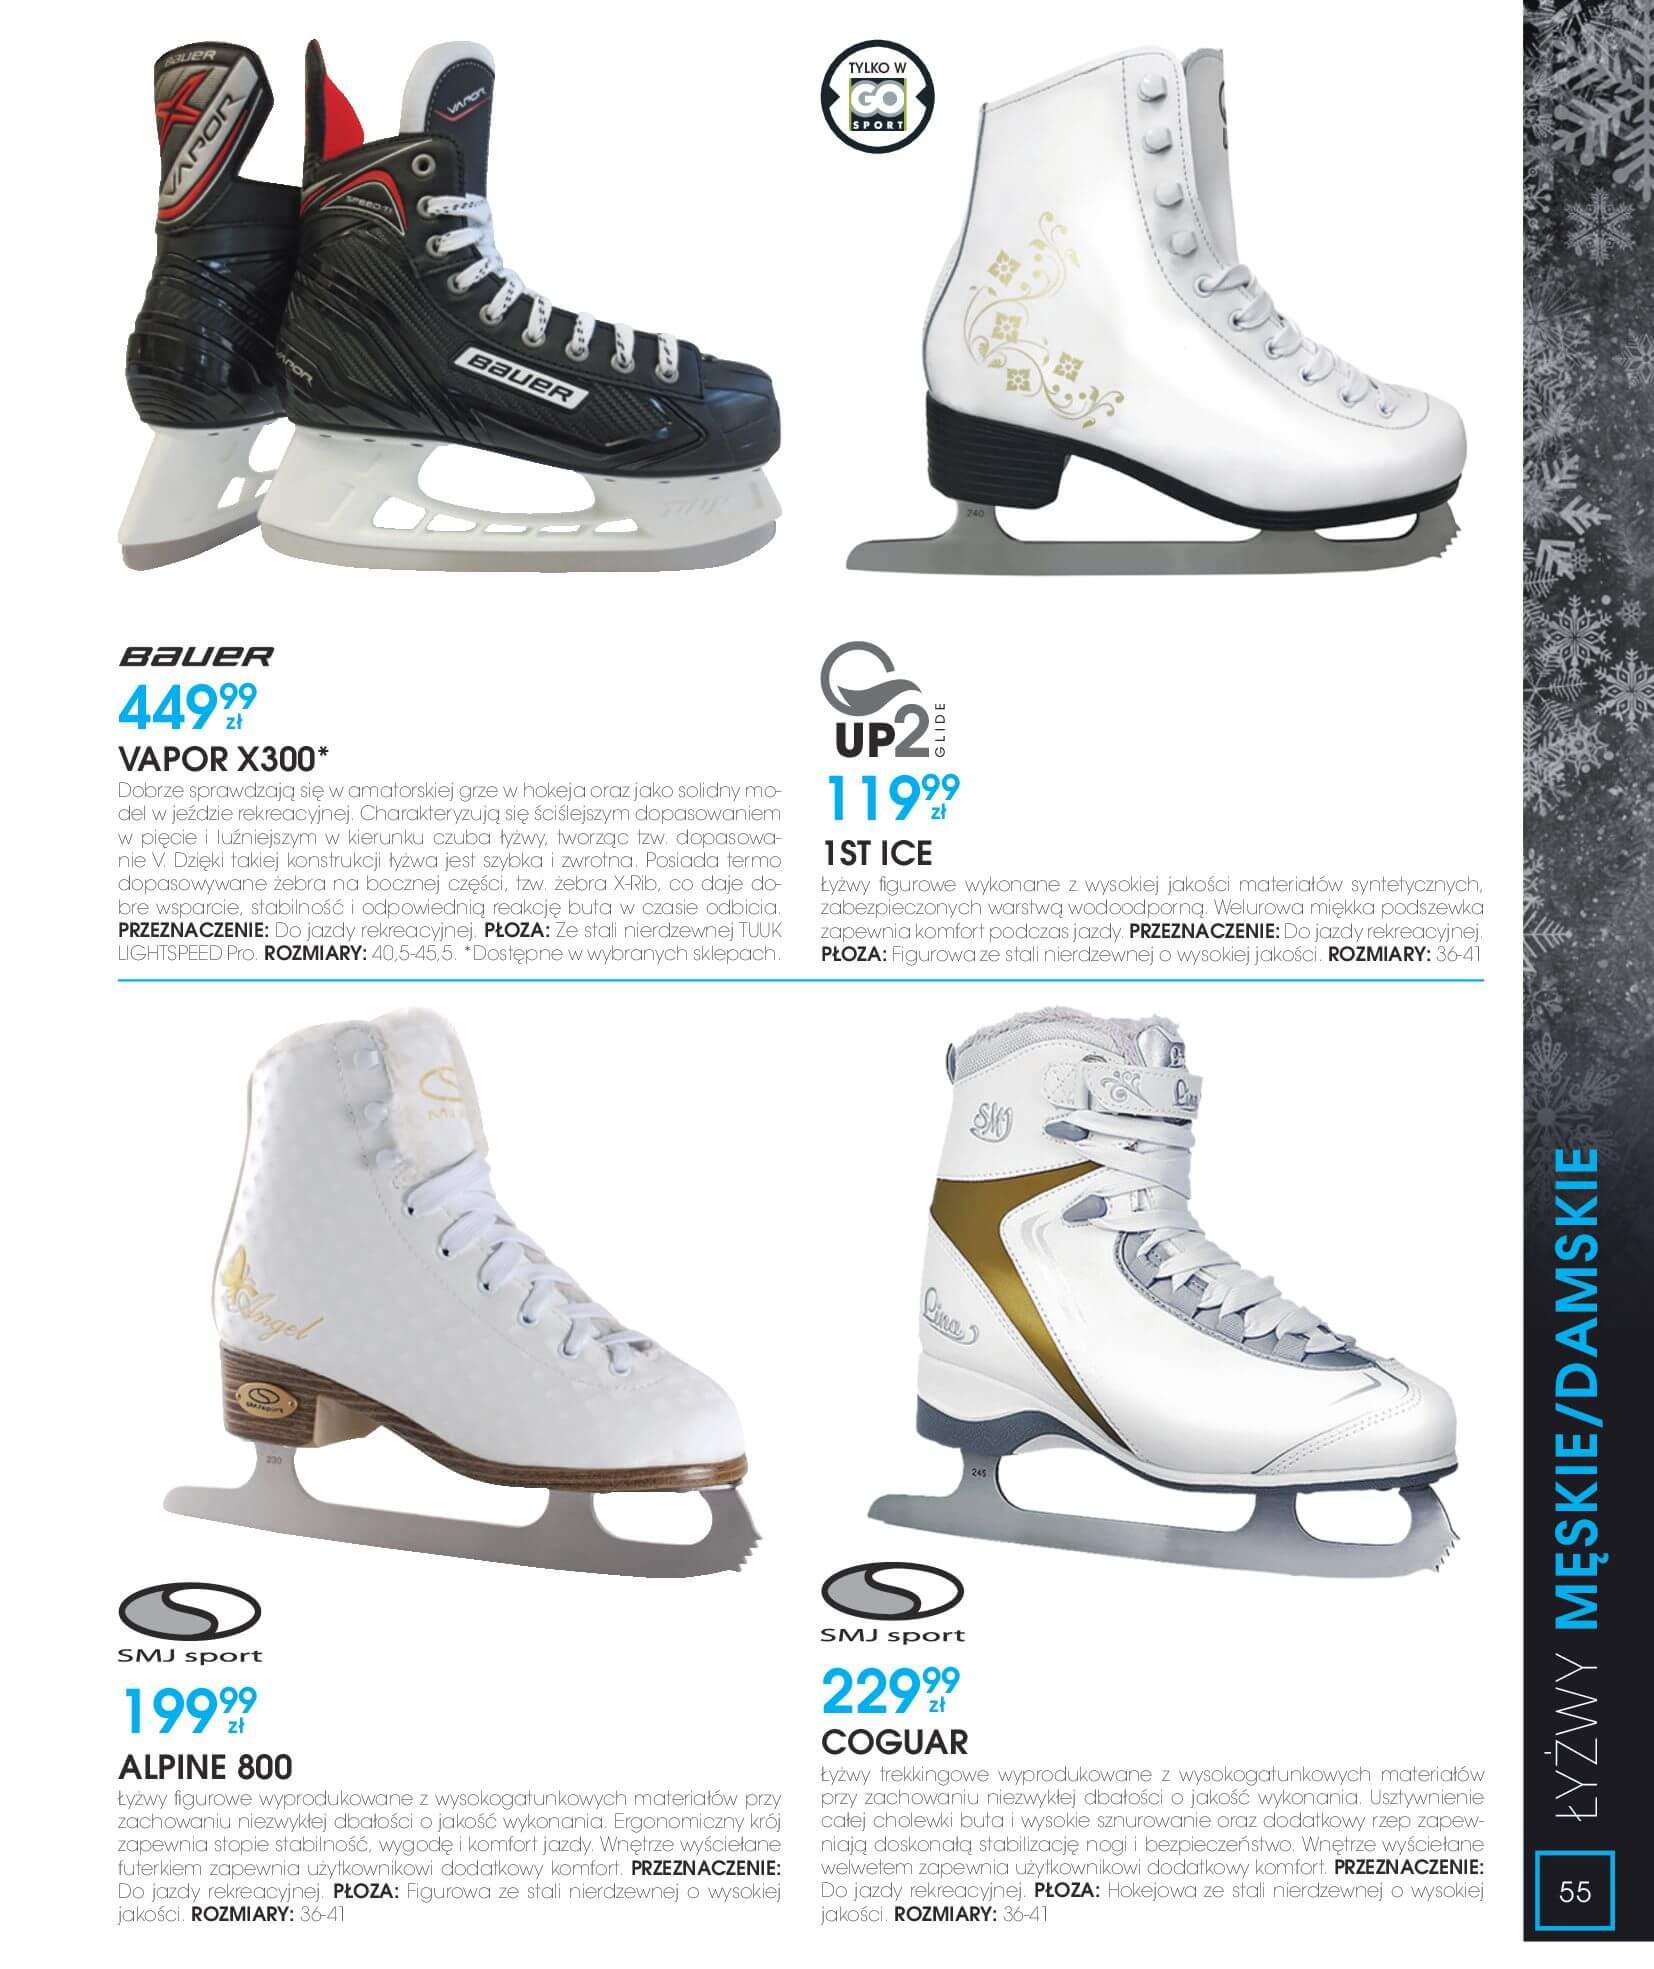 Gazetka Go Sport - Katalog Zima 2017/2018-12.11.2017-28.02.2018-page-55